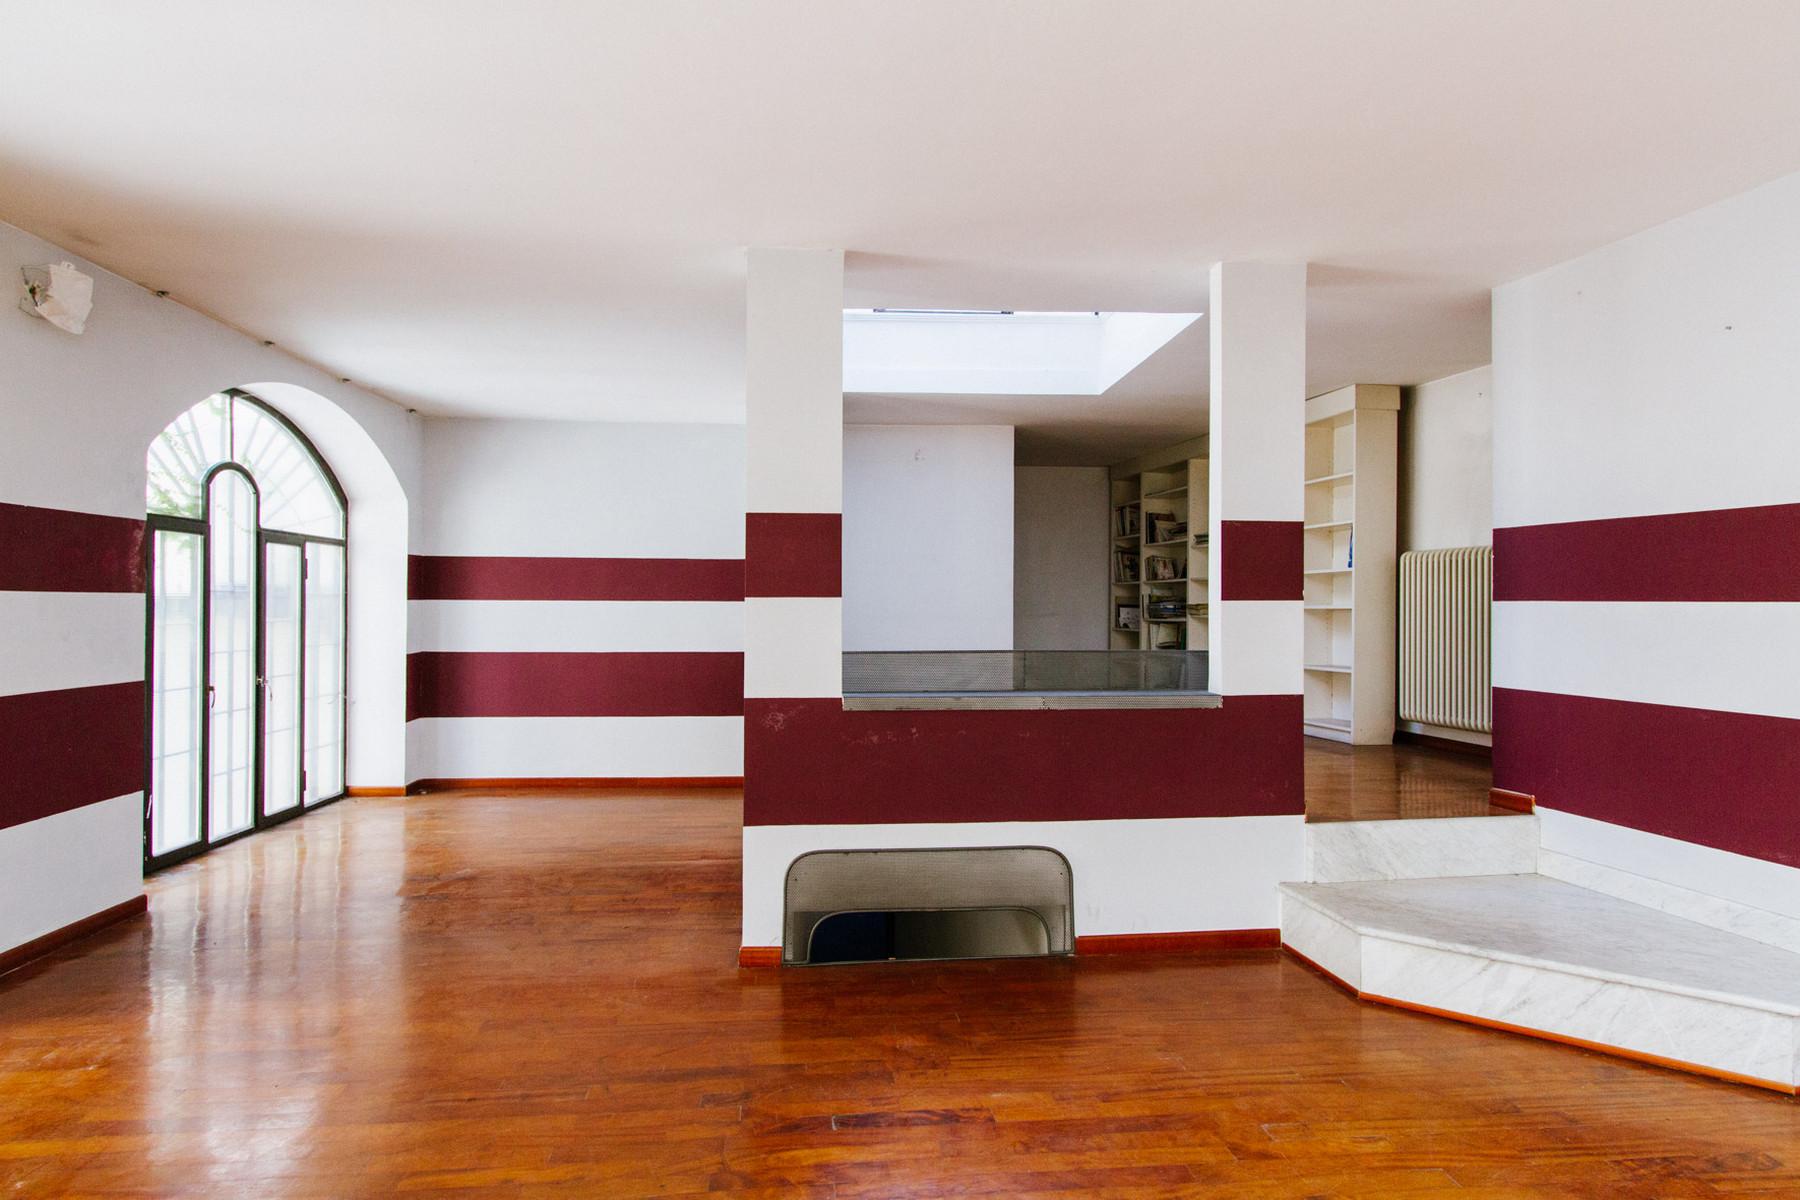 Casa indipendente in Vendita a Torino: 5 locali, 699 mq - Foto 7